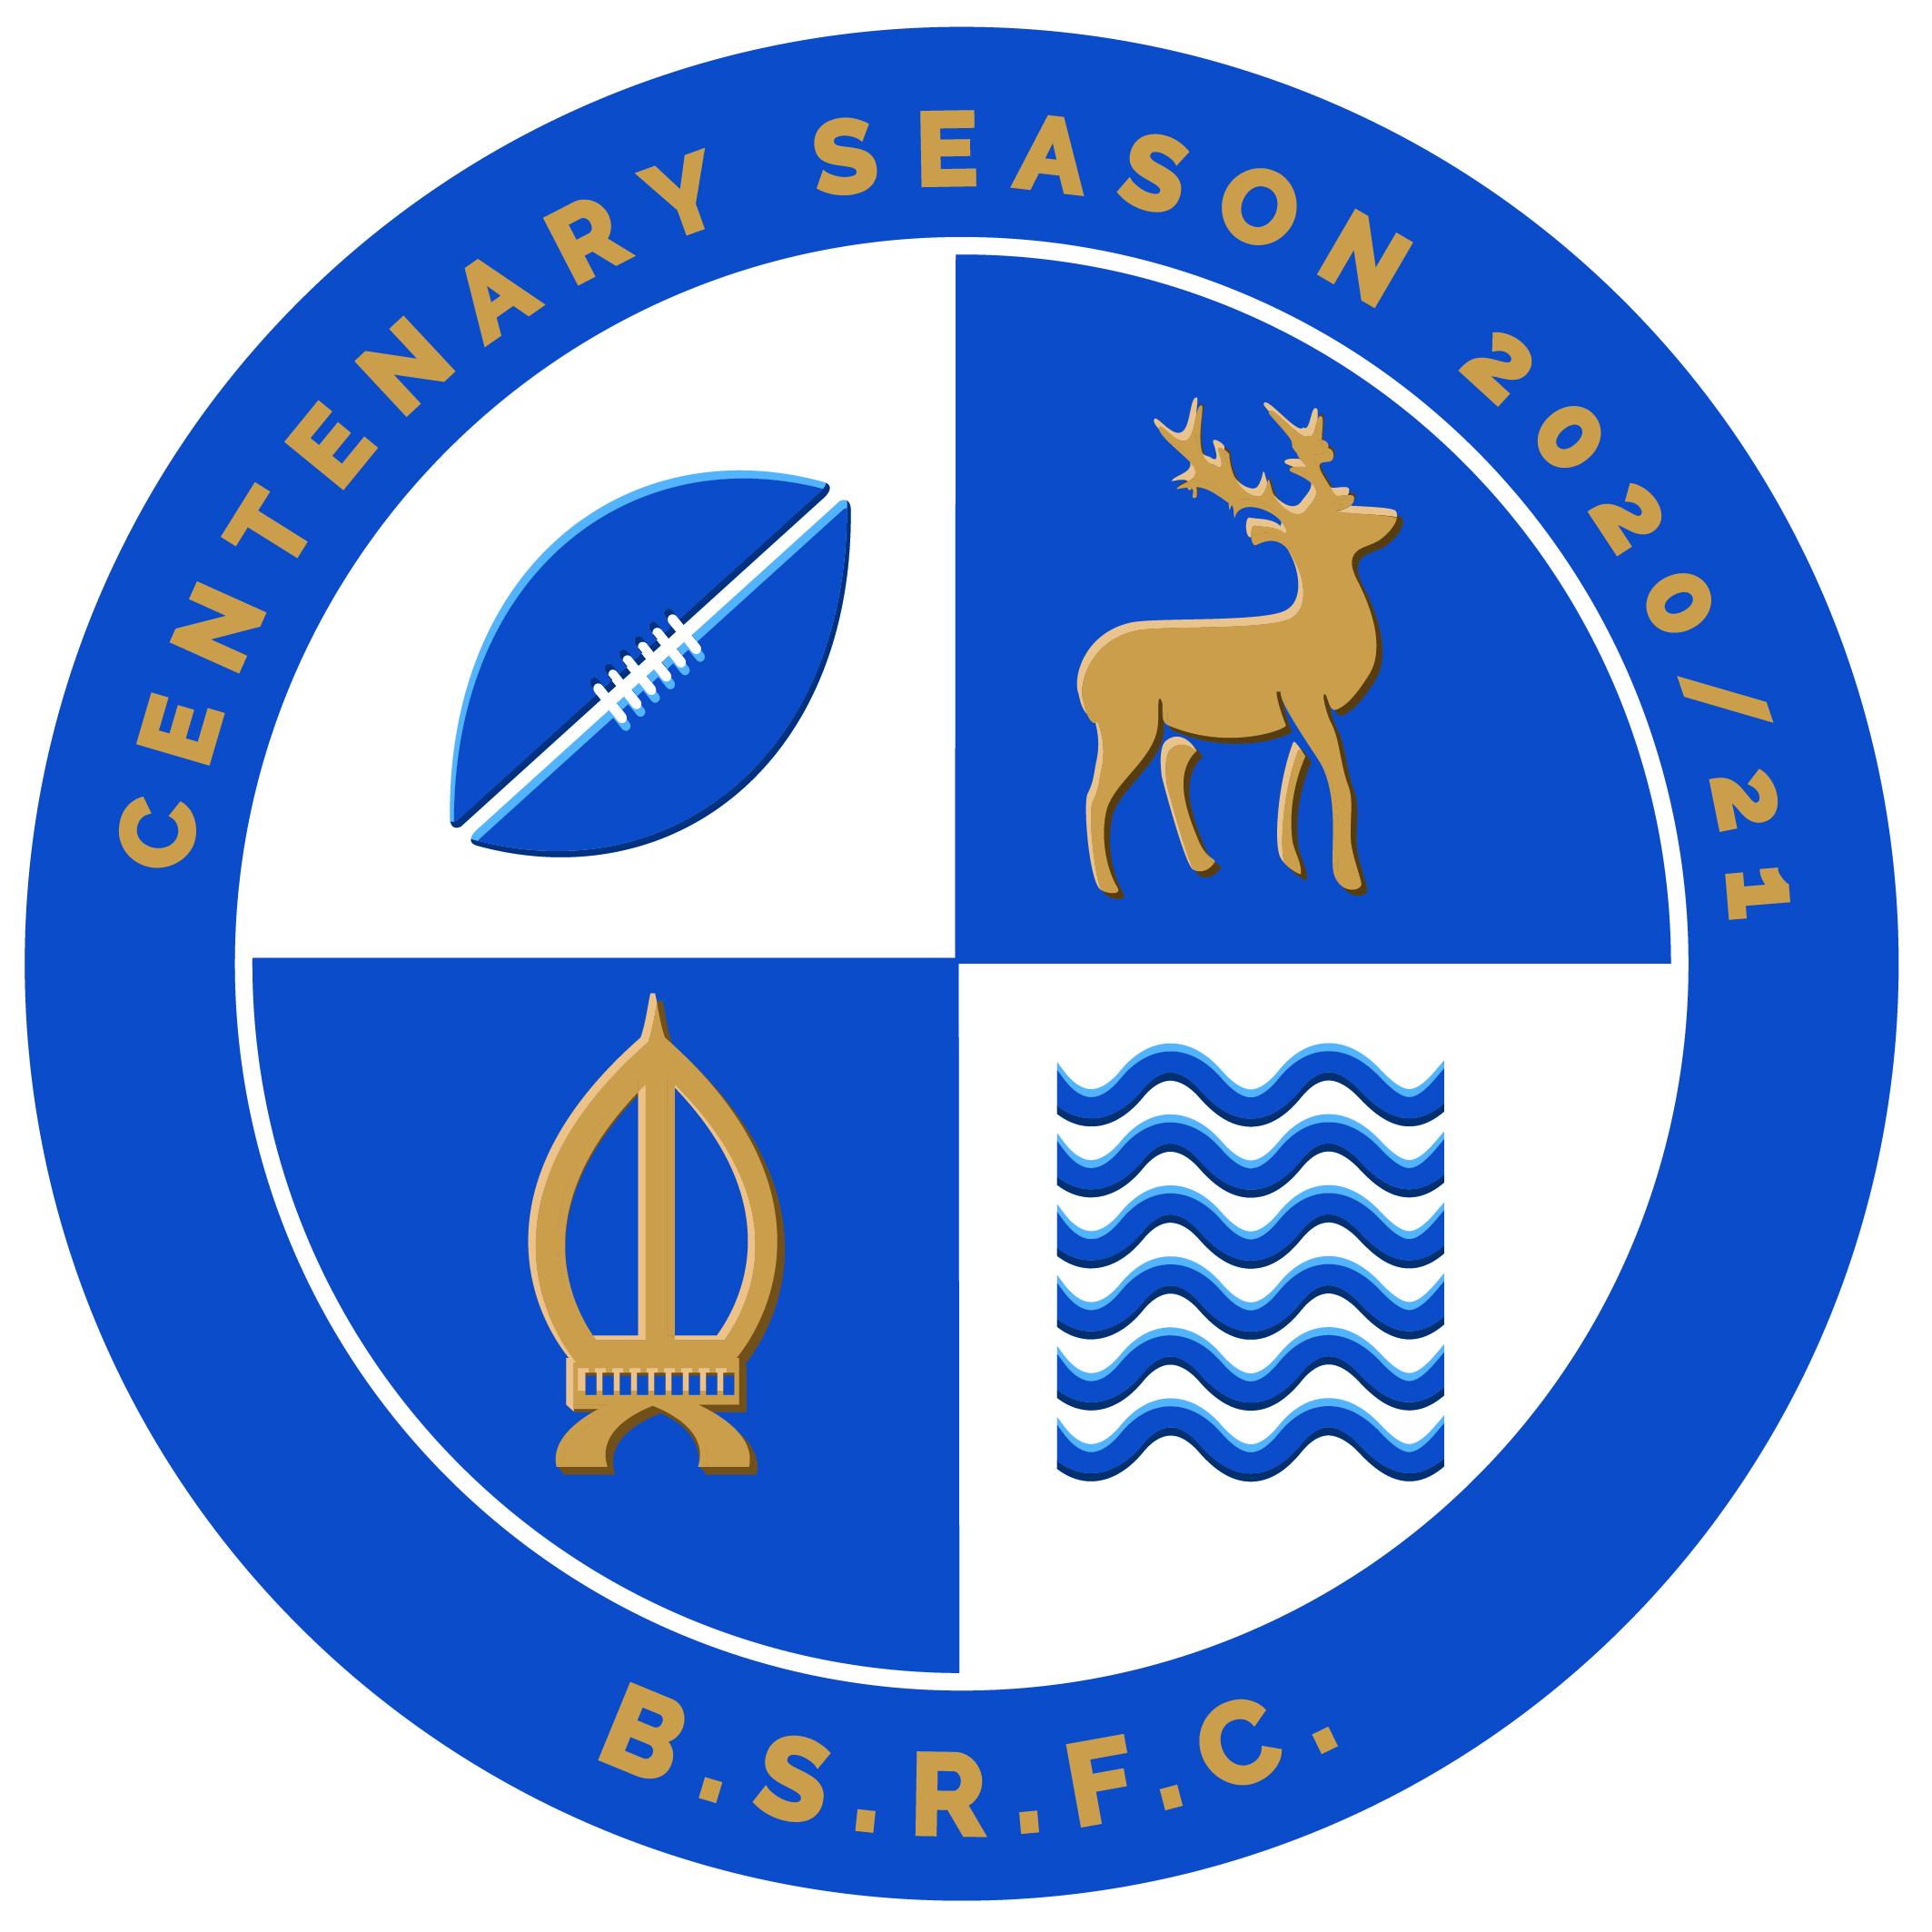 The Bishop's Stortford Rugby Club